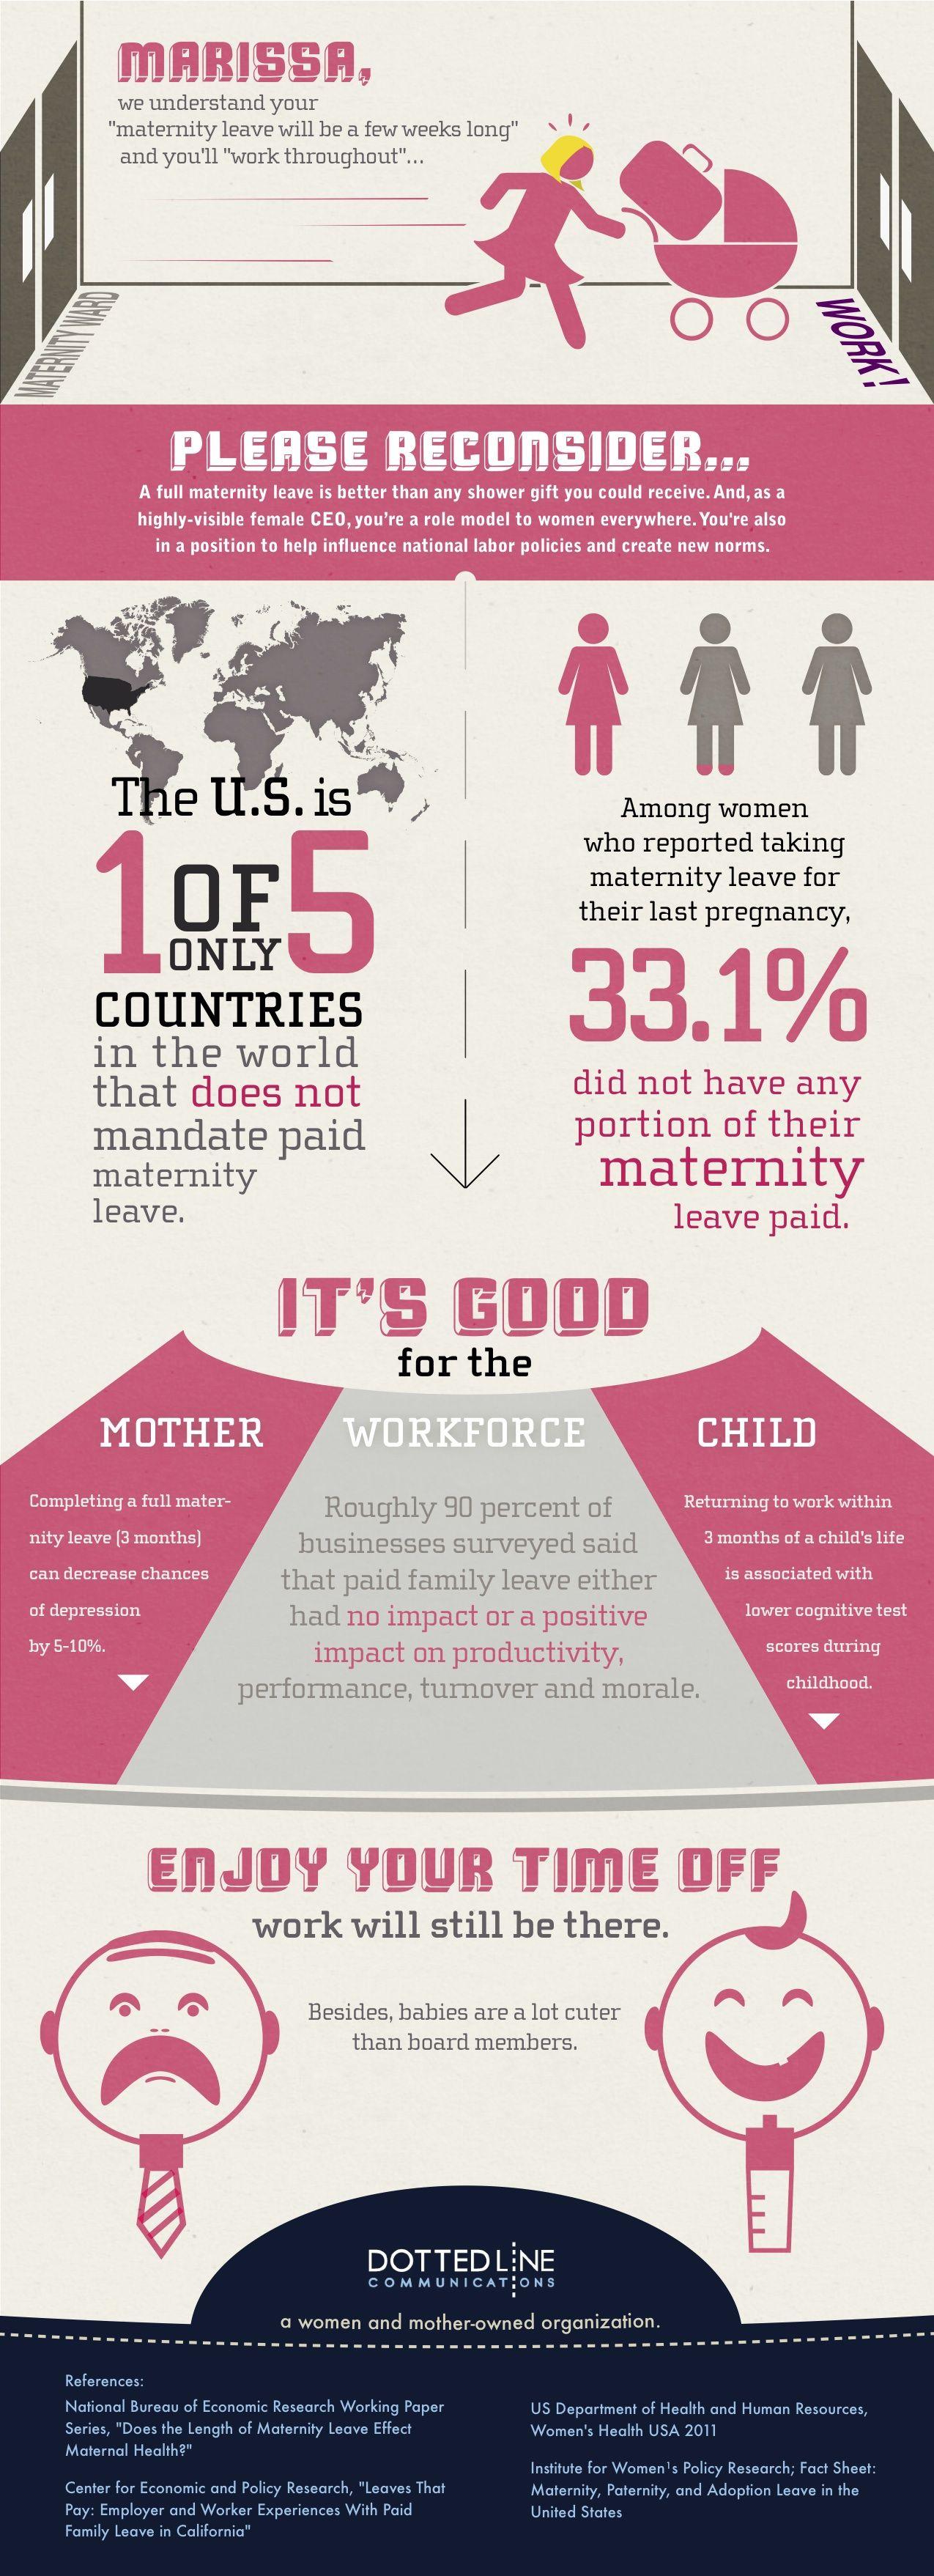 Marissa mayer maternity leave marissa mayer maternity